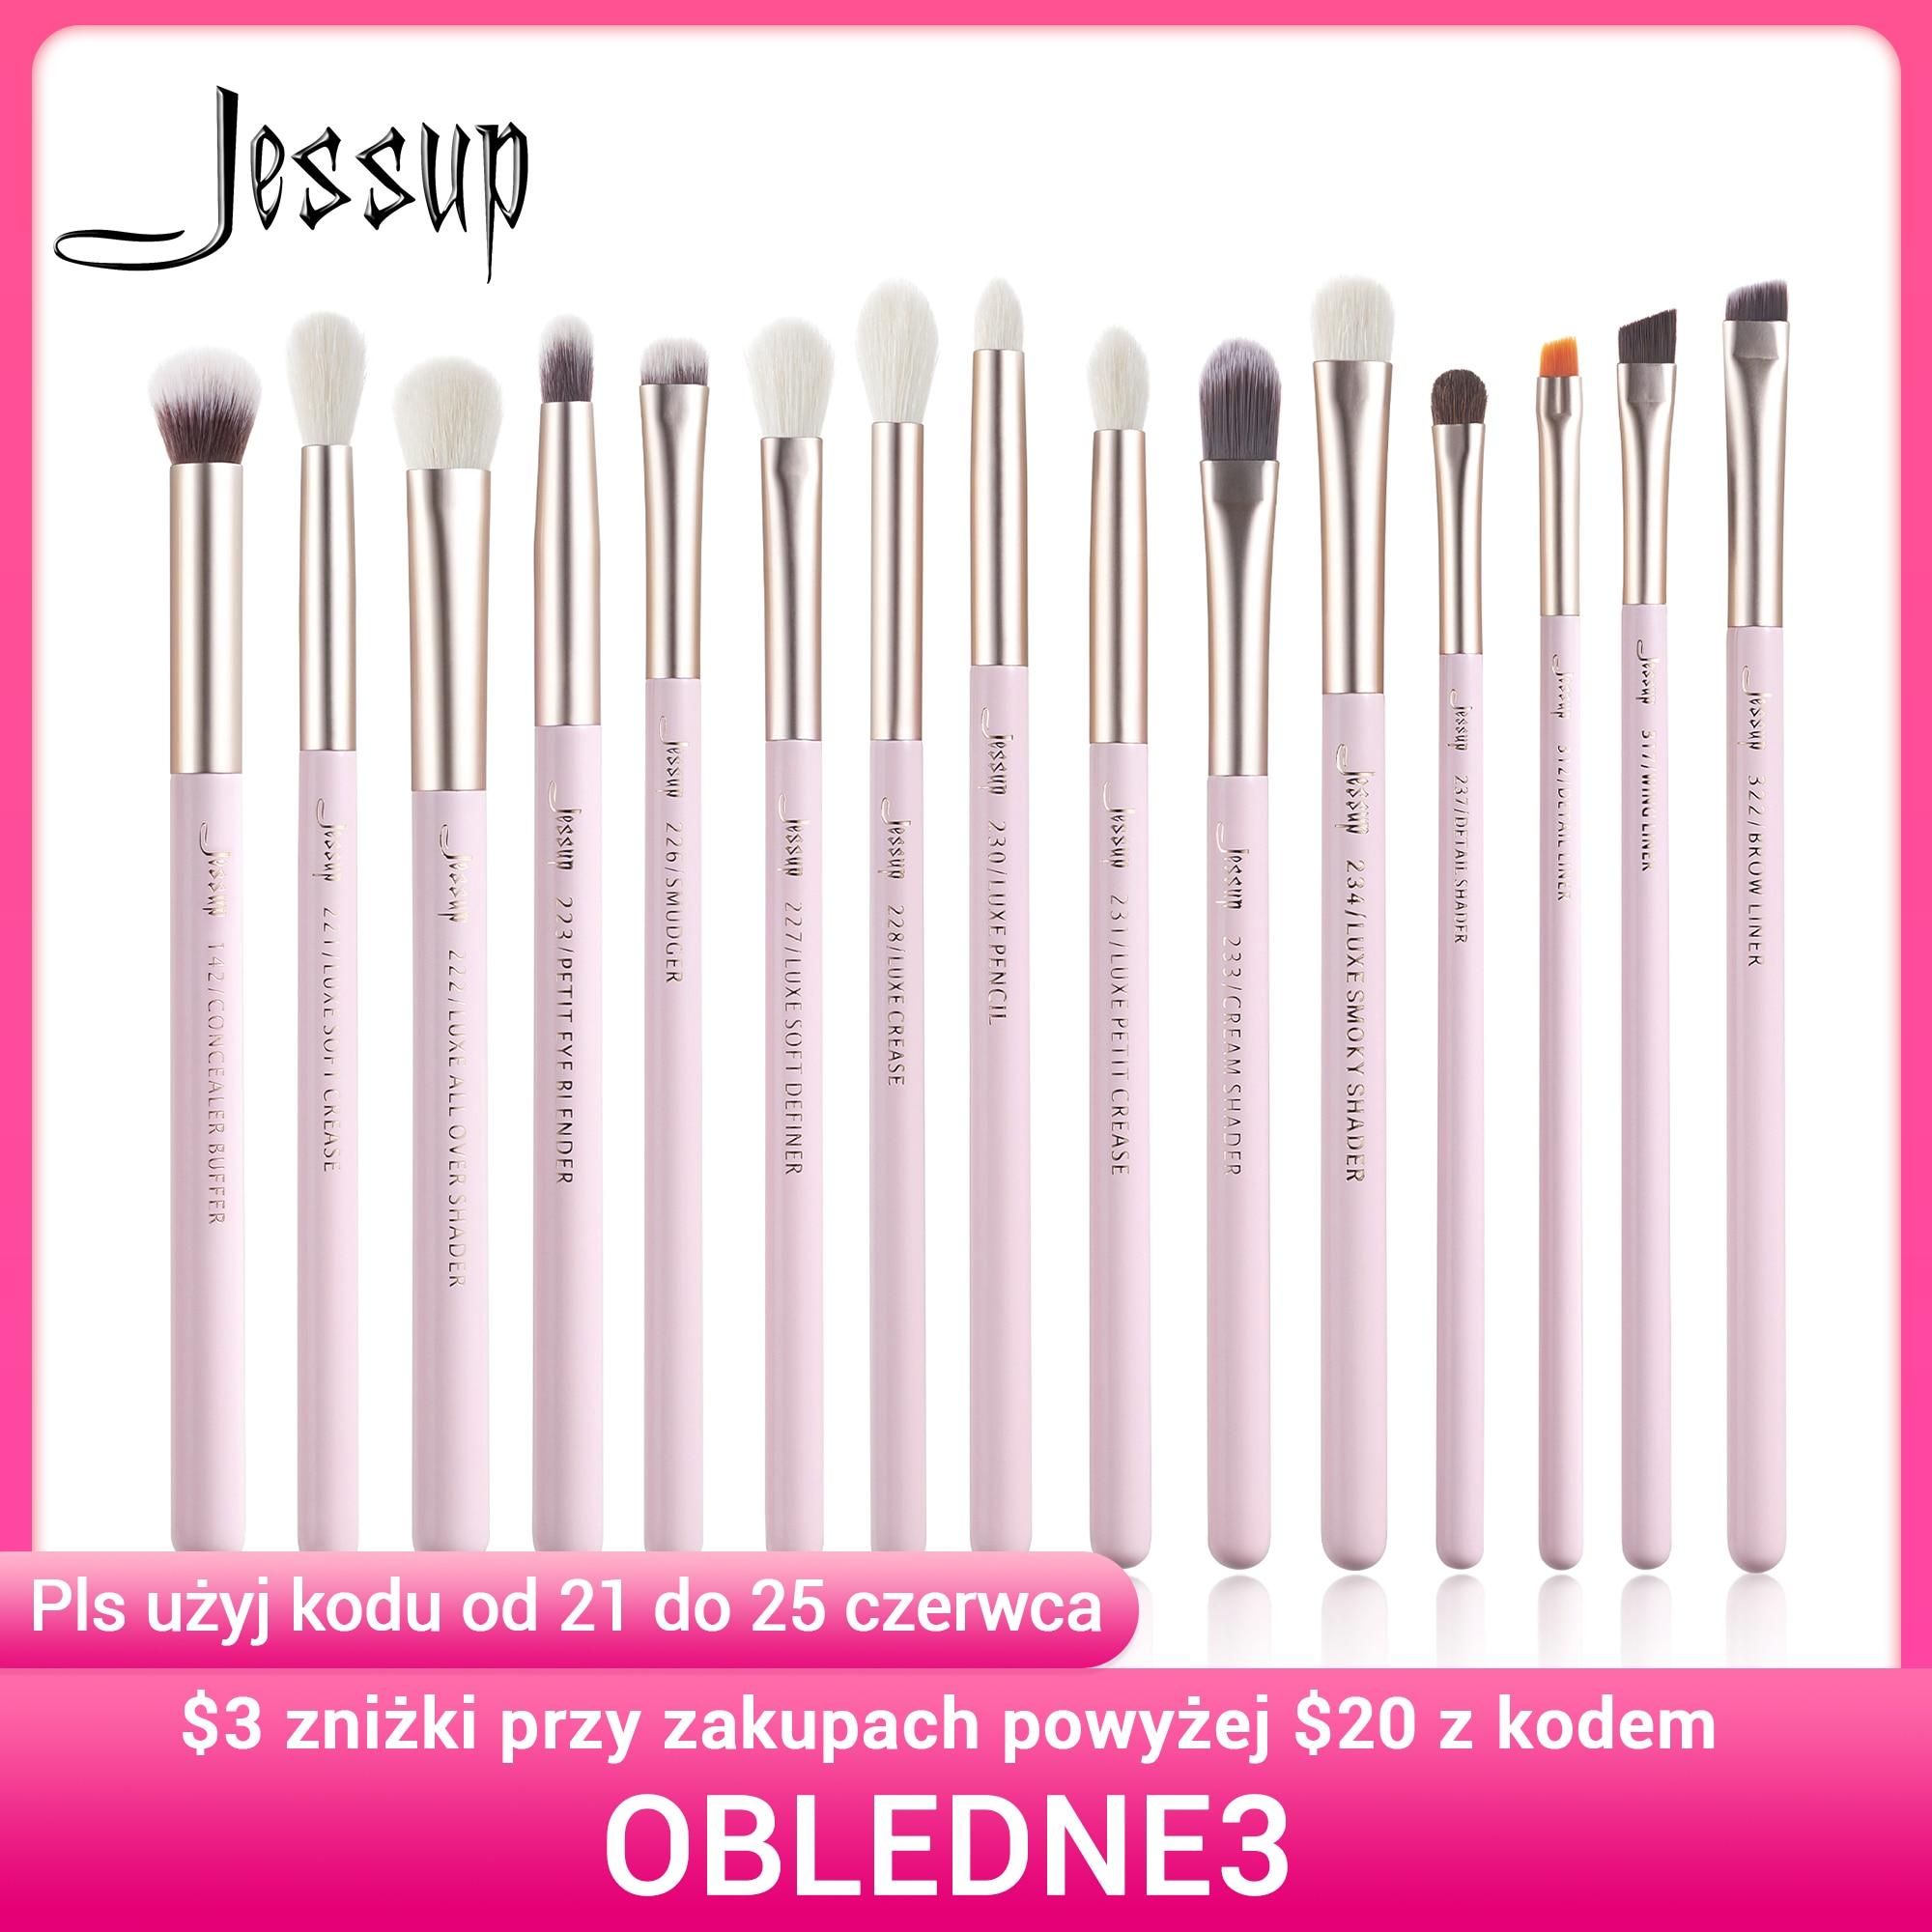 Jessup Makeup Brushes Set 15pcs Professional Eye Makeup Brush Kits Eyeshadow Eyeliner Eyebrow Blending Concealer Brochas